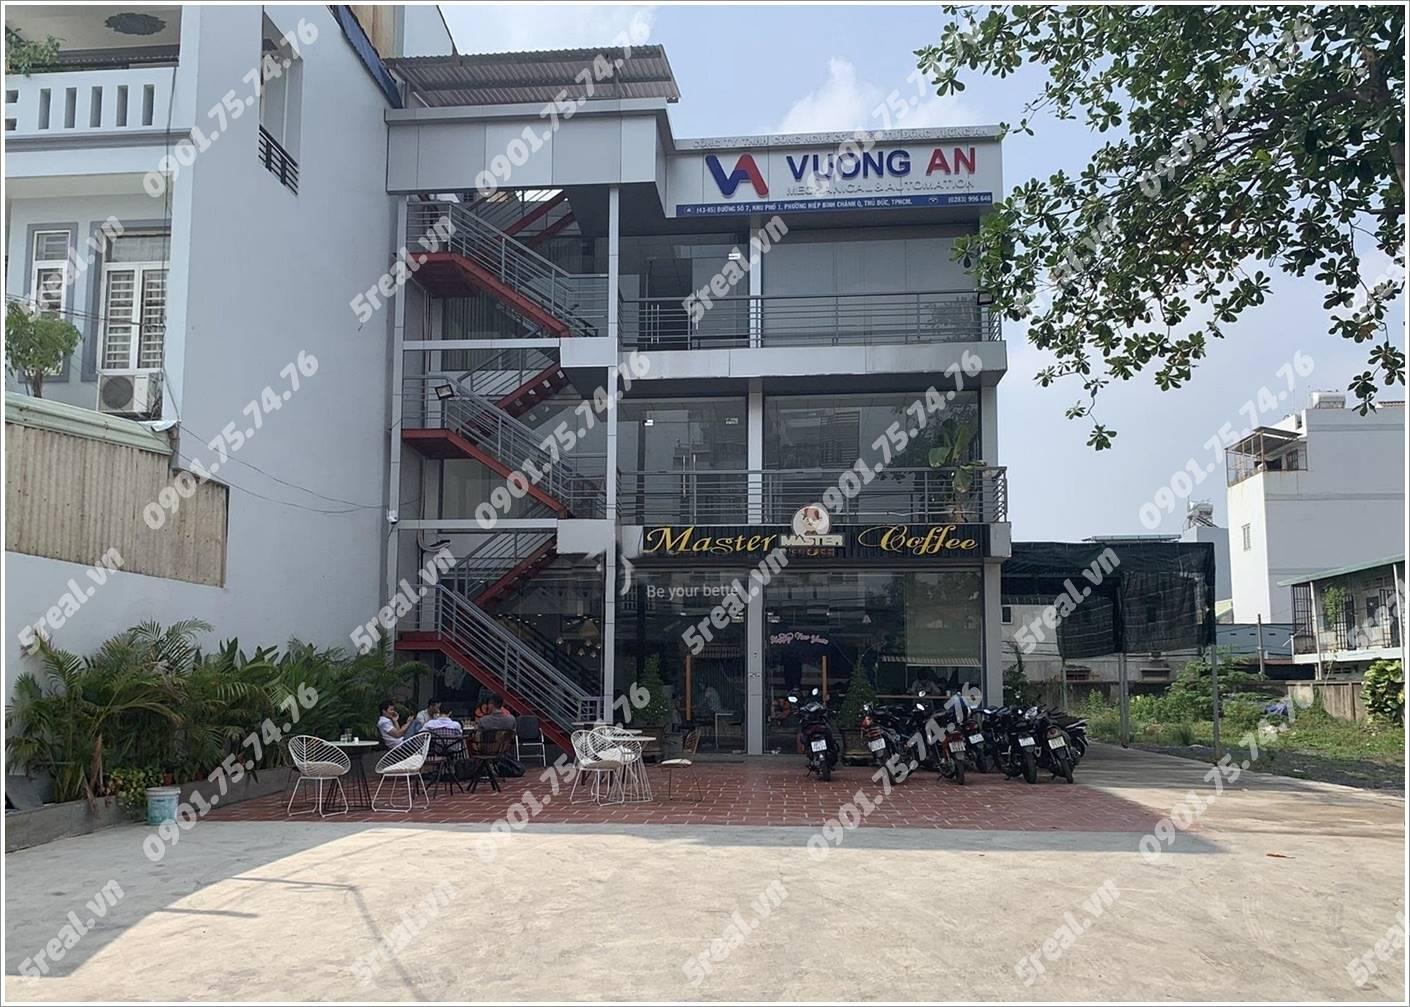 vuong-an-building-duong-so-7-quan-thu-duc-van-phong-cho-thue-tphcm-5real.vn-01